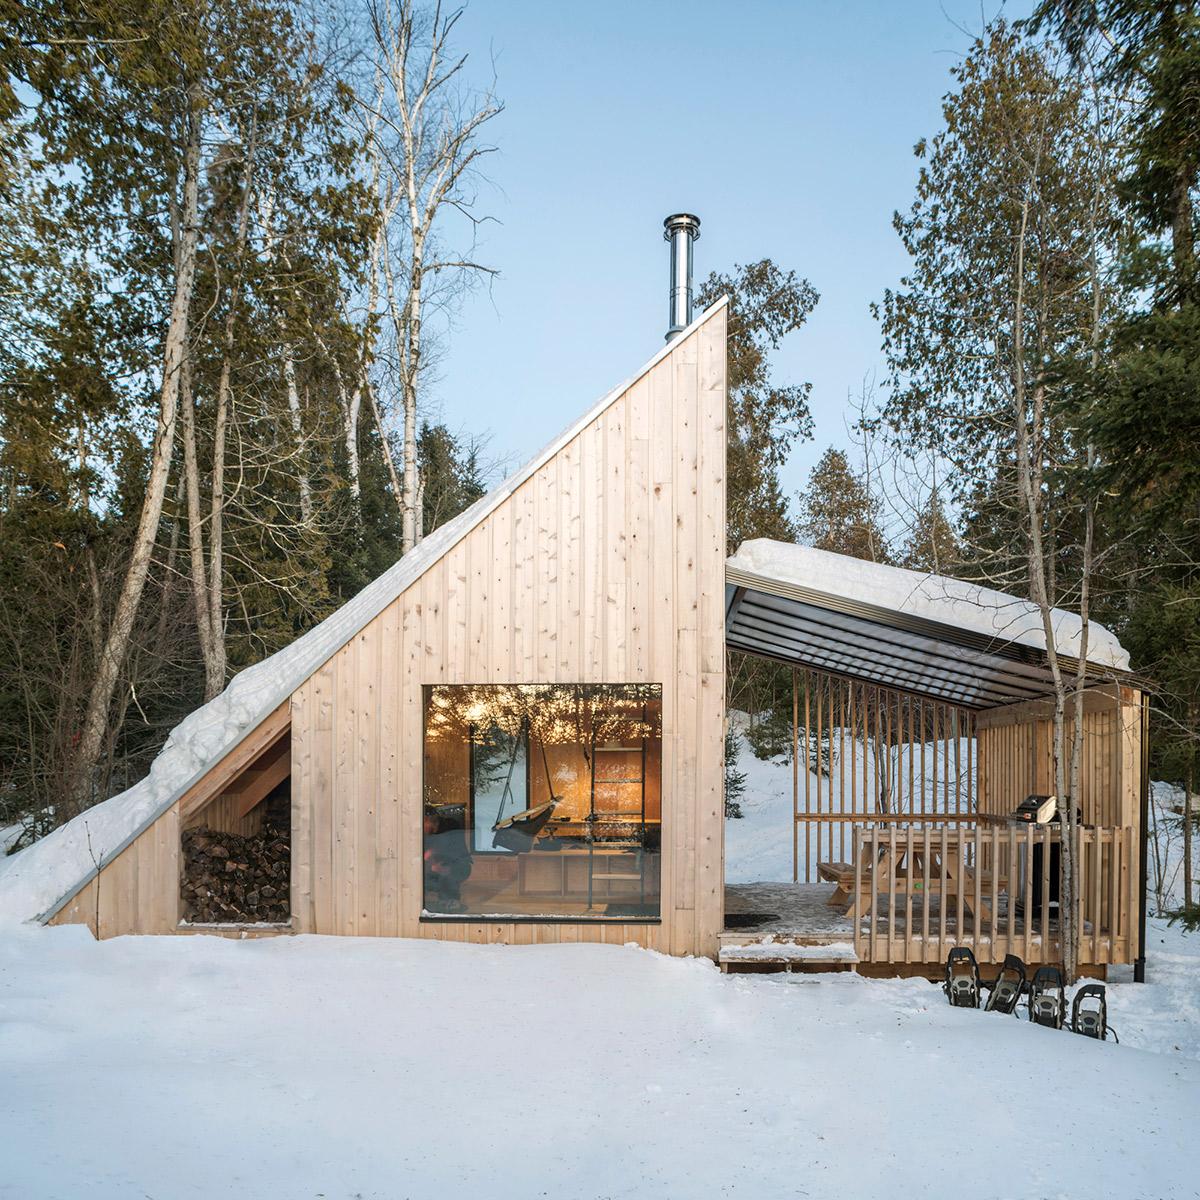 Cozy compact cabin remixes the A-frame